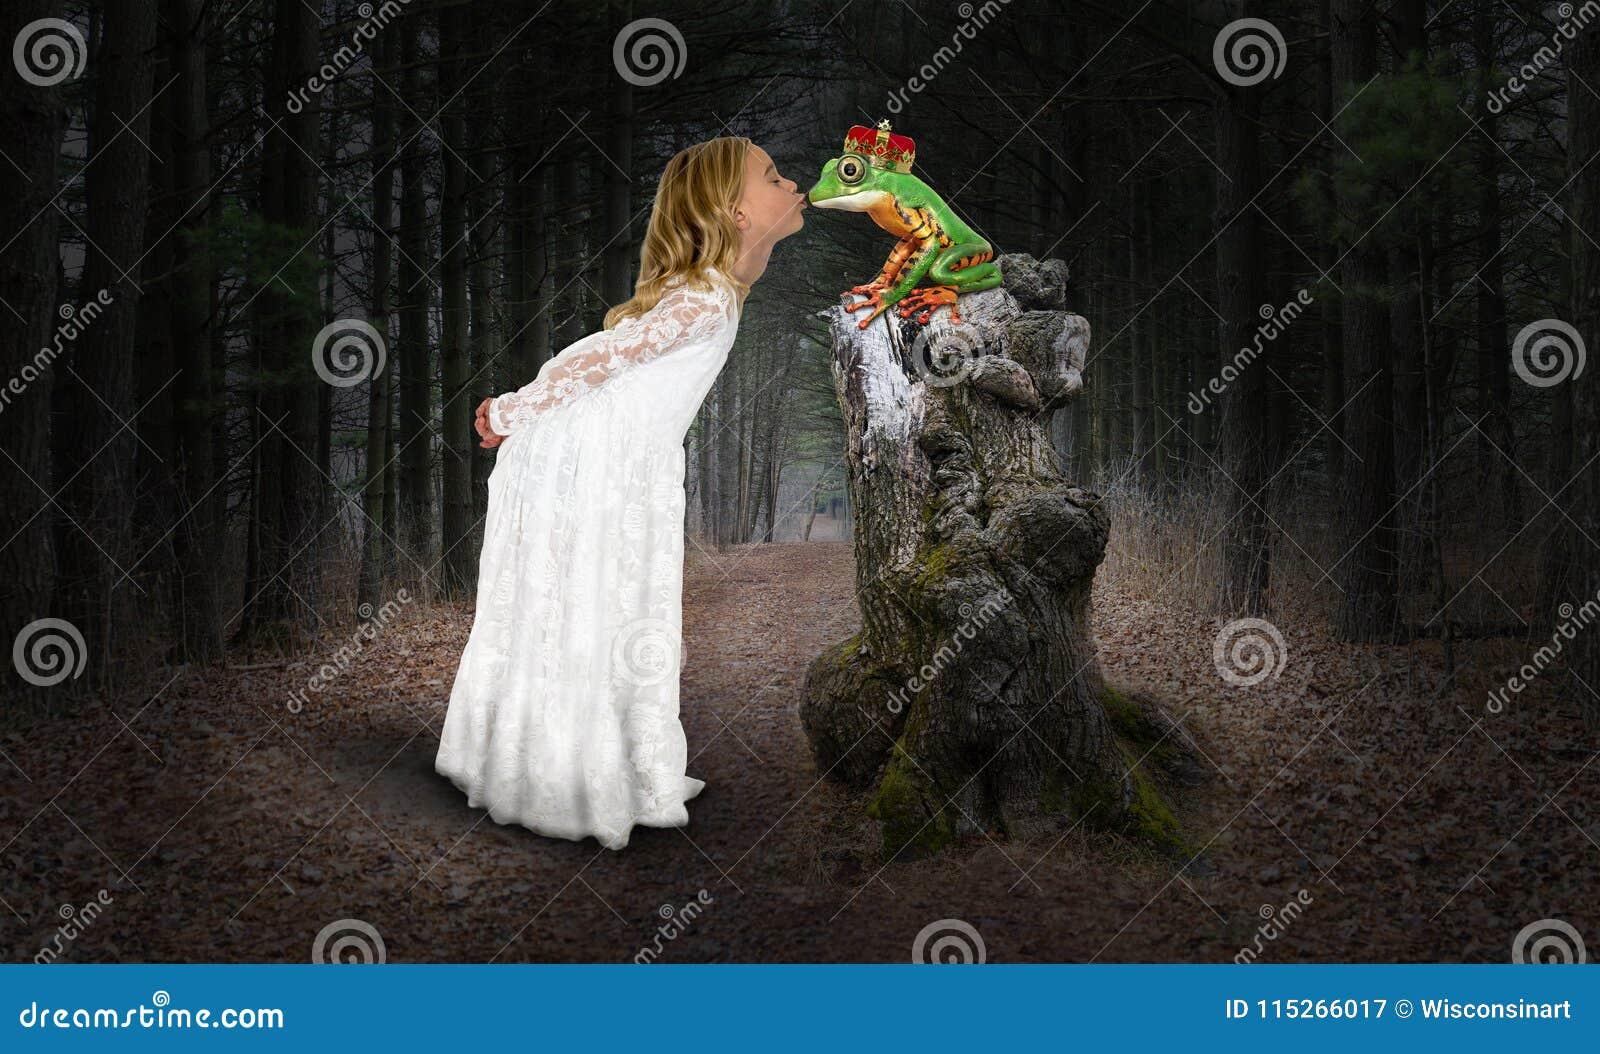 Menina, princesa, beijo, beijando a rã, fantasia